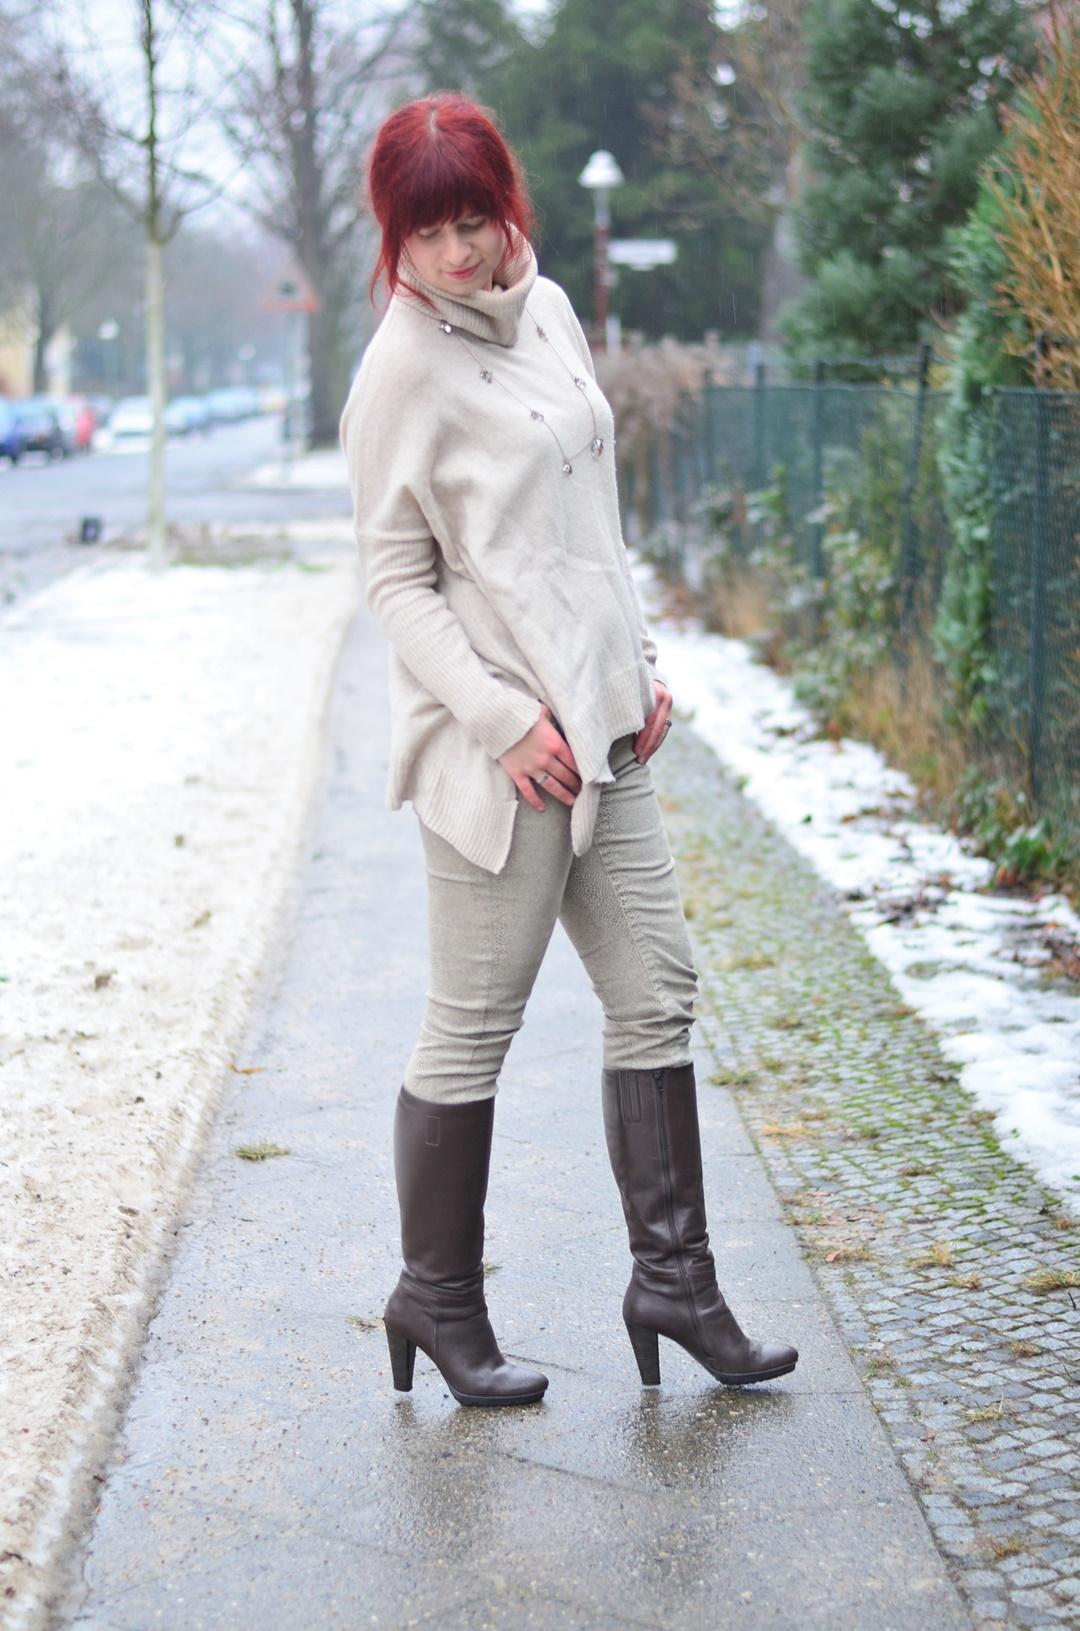 outfitpost_fashionblog_annanikabu_fashion_herbstoutfit_braune-stiefel_poncho_braunschweig-2